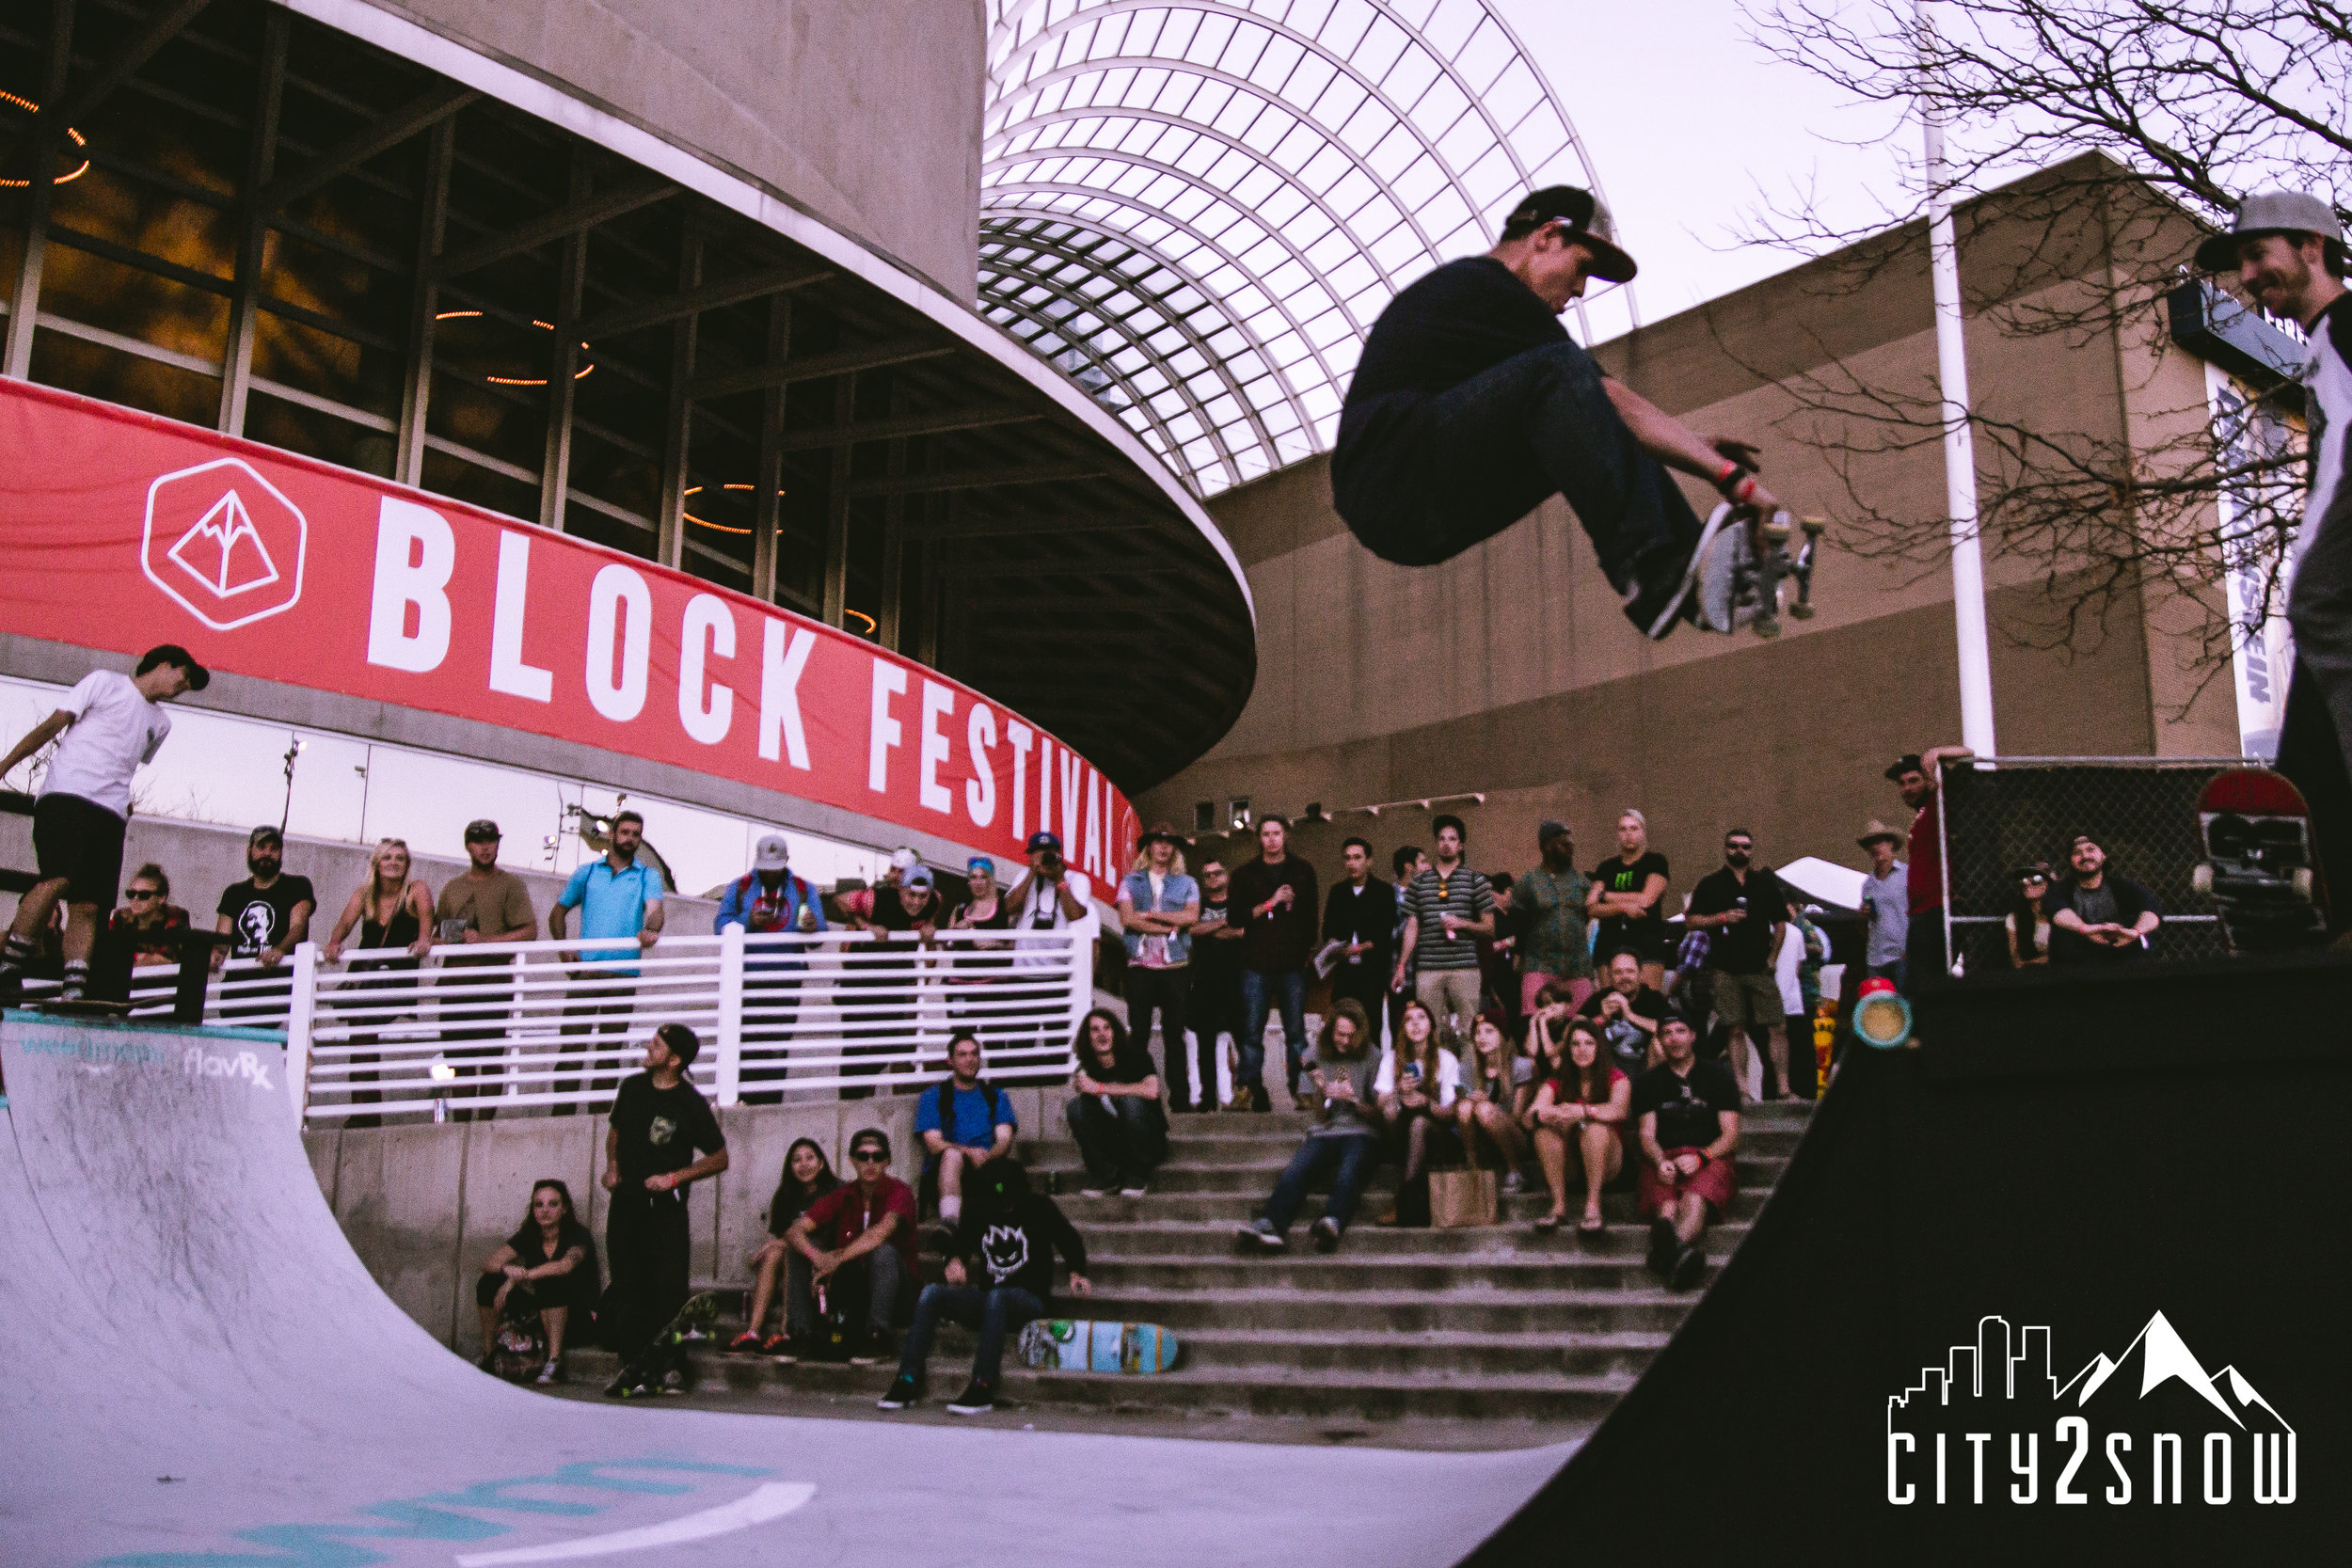 blockfestival-day2-3.jpg